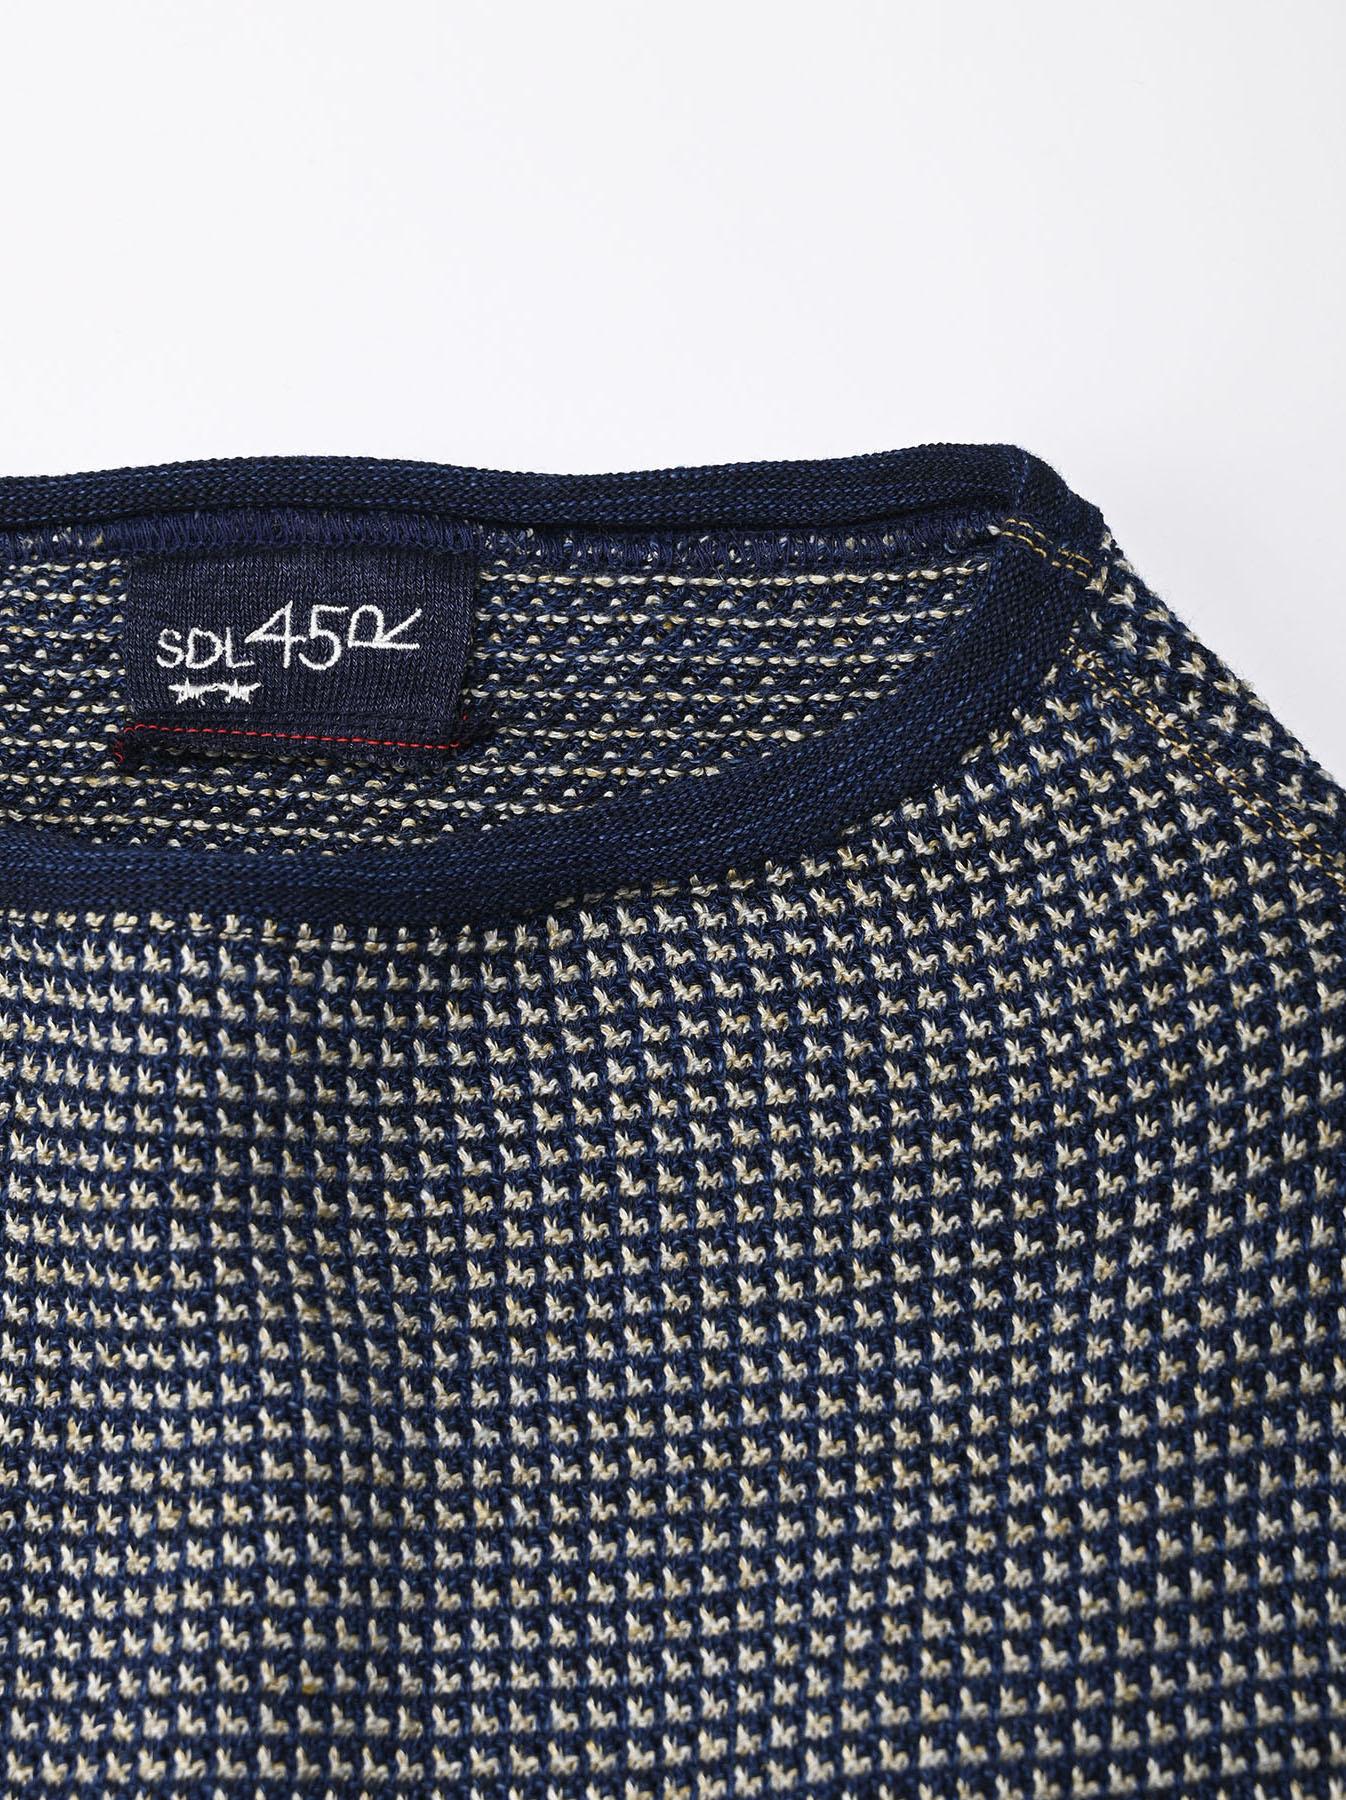 Indigo Tappet Kanoko Umahiko Sweater-9